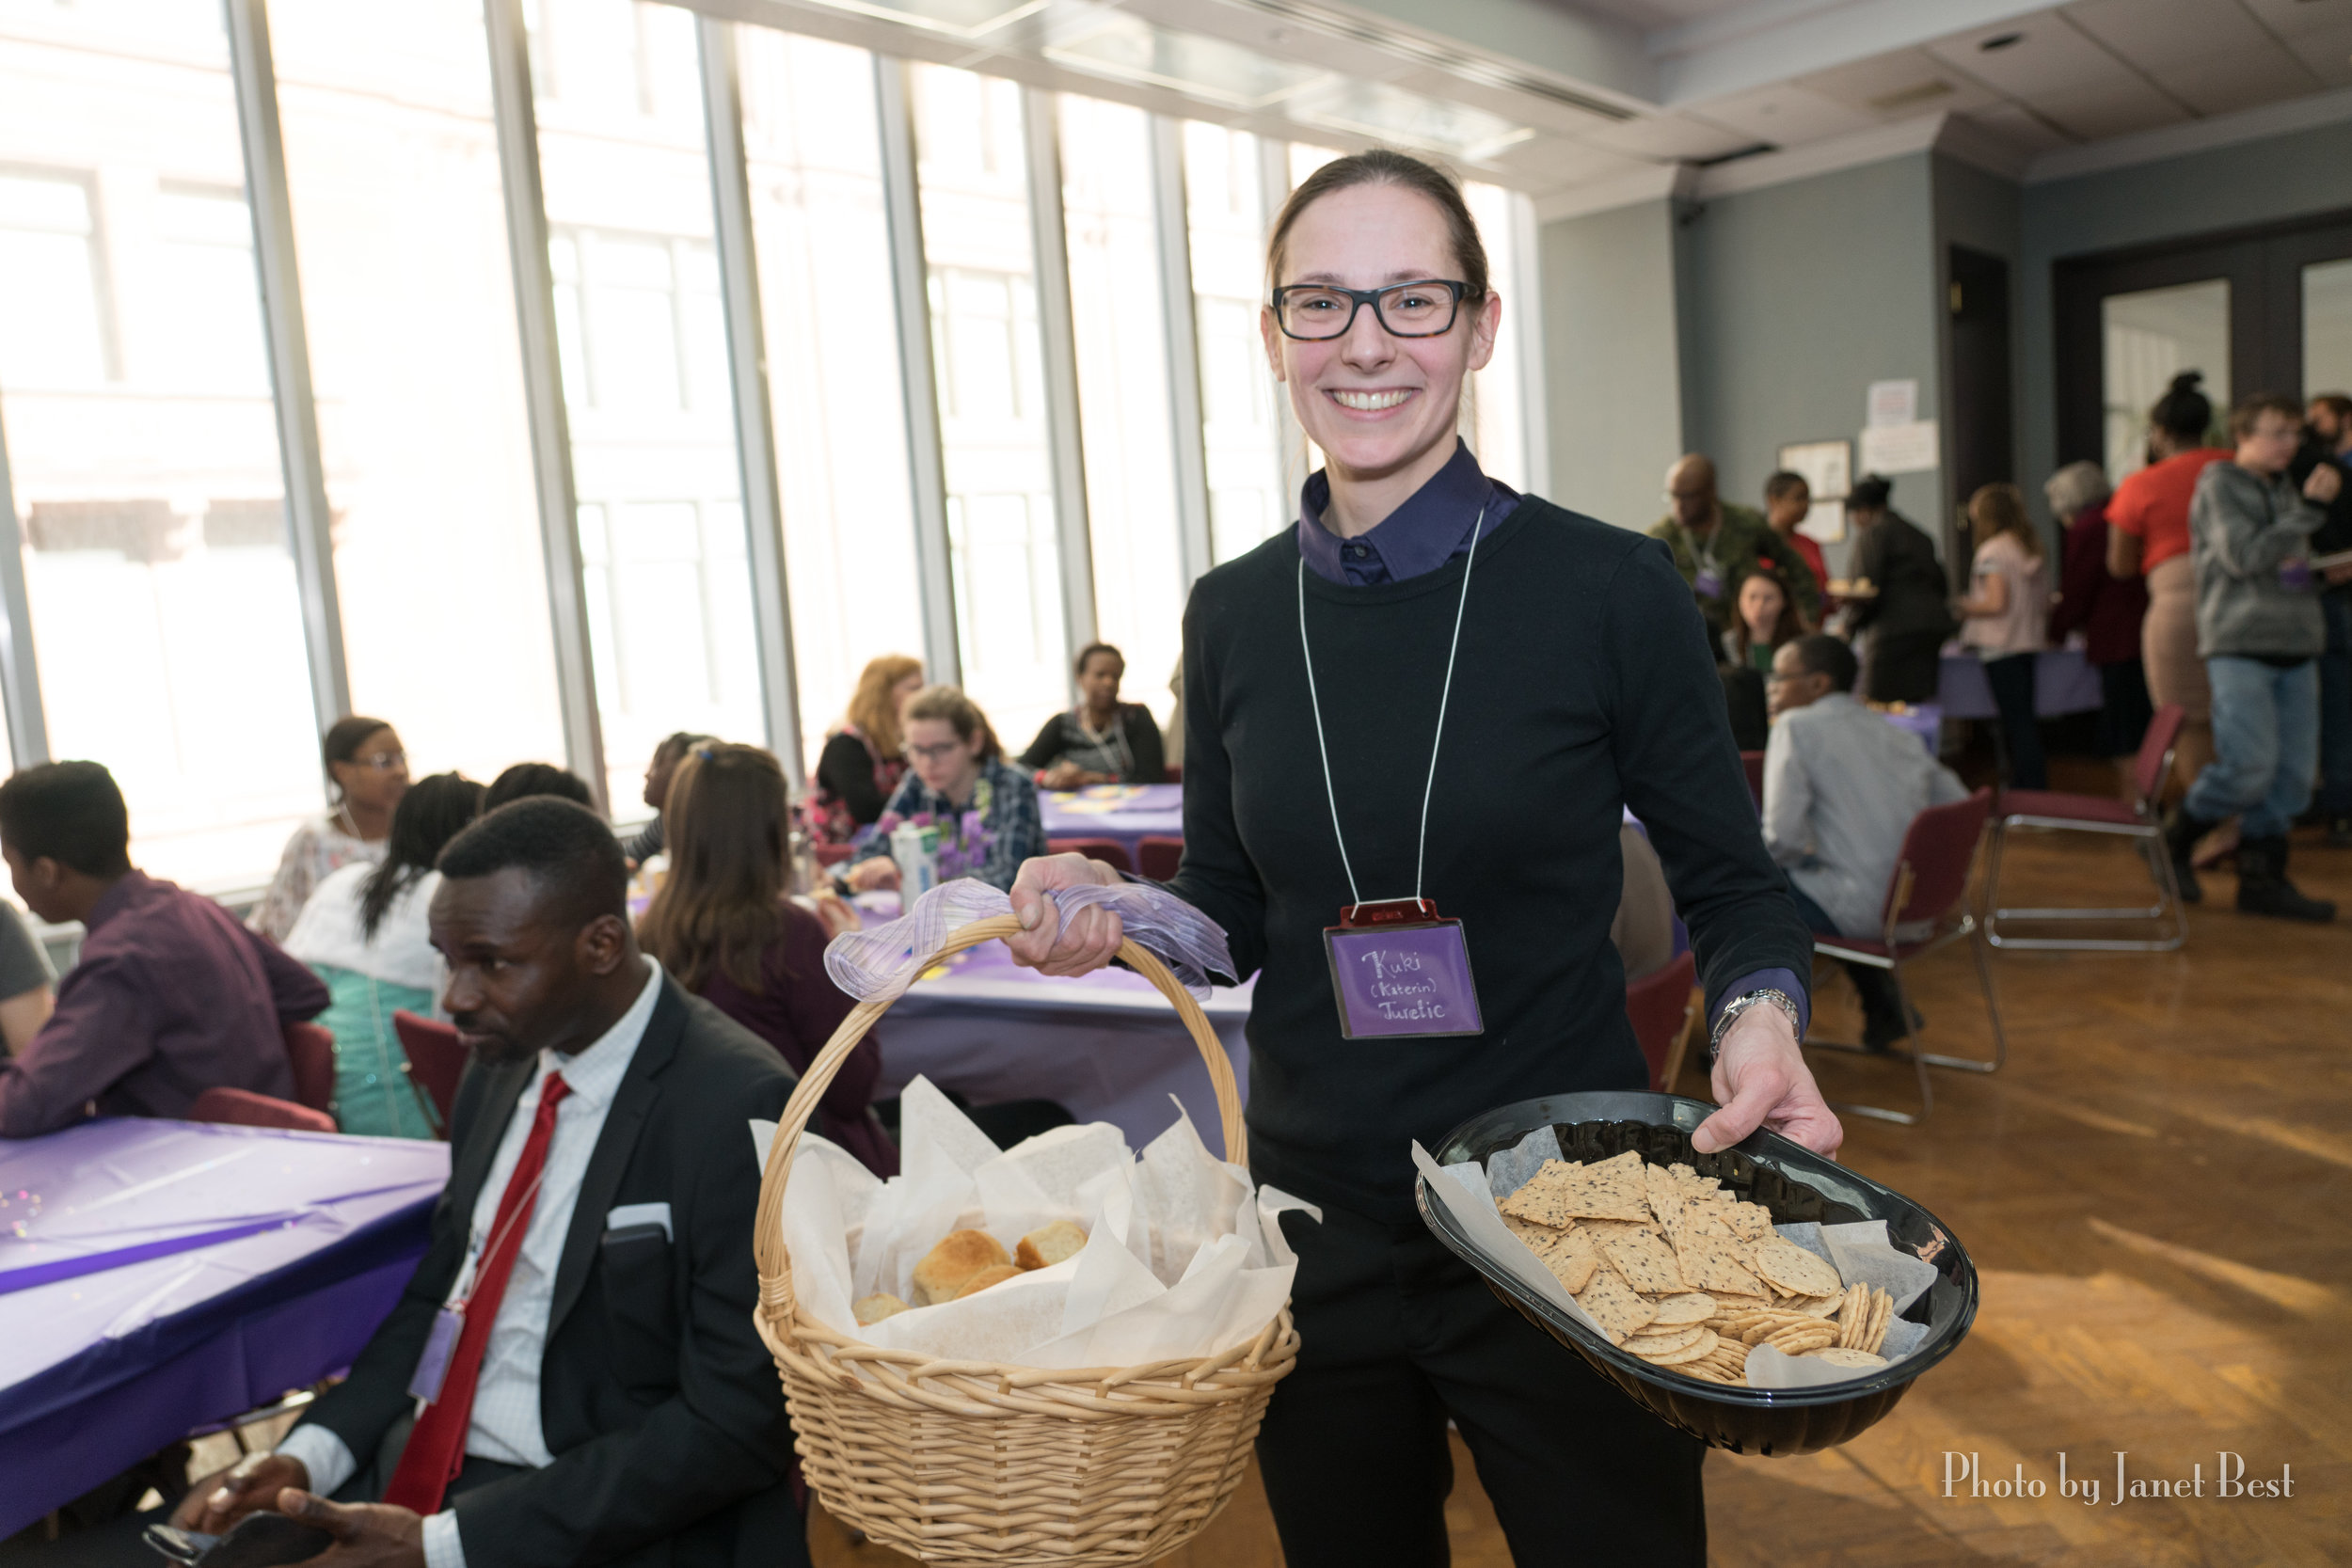 Kuki (Katerin Juretic) demonstrates the true meaning of hospitality